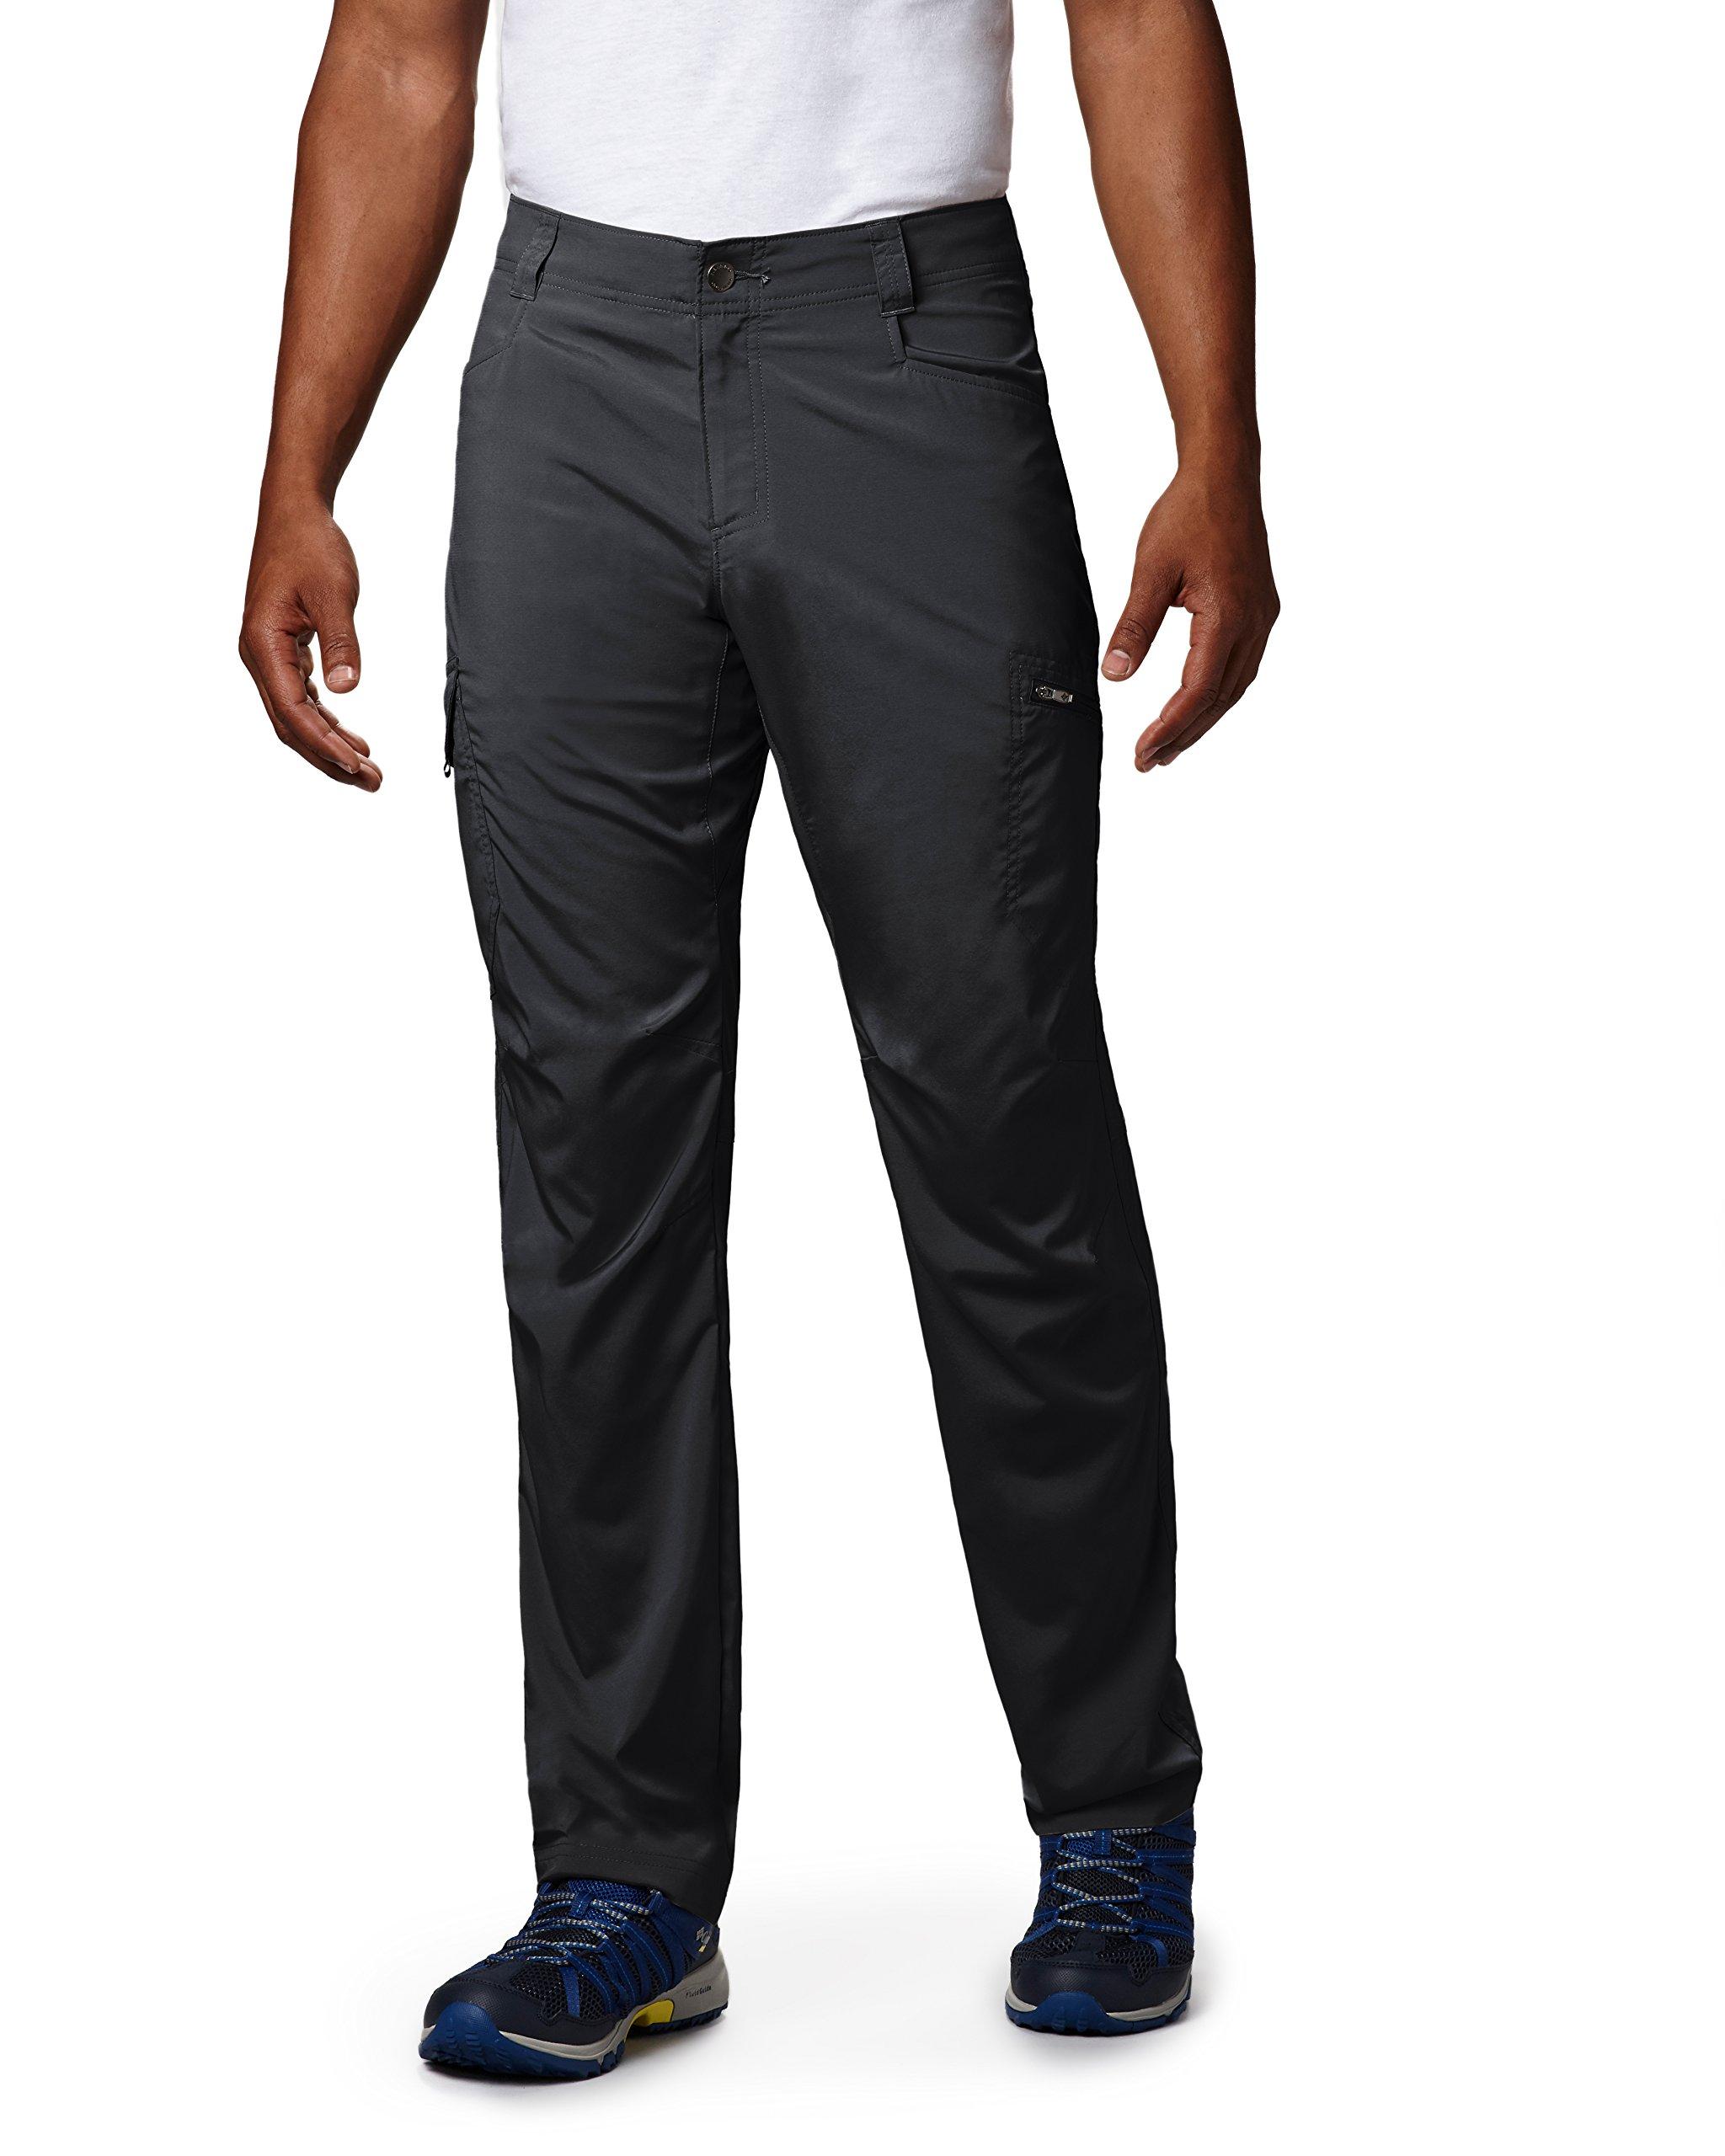 Columbia Men's Silver Ridge Stretch Pants, 34'' x 30'', Black by Columbia